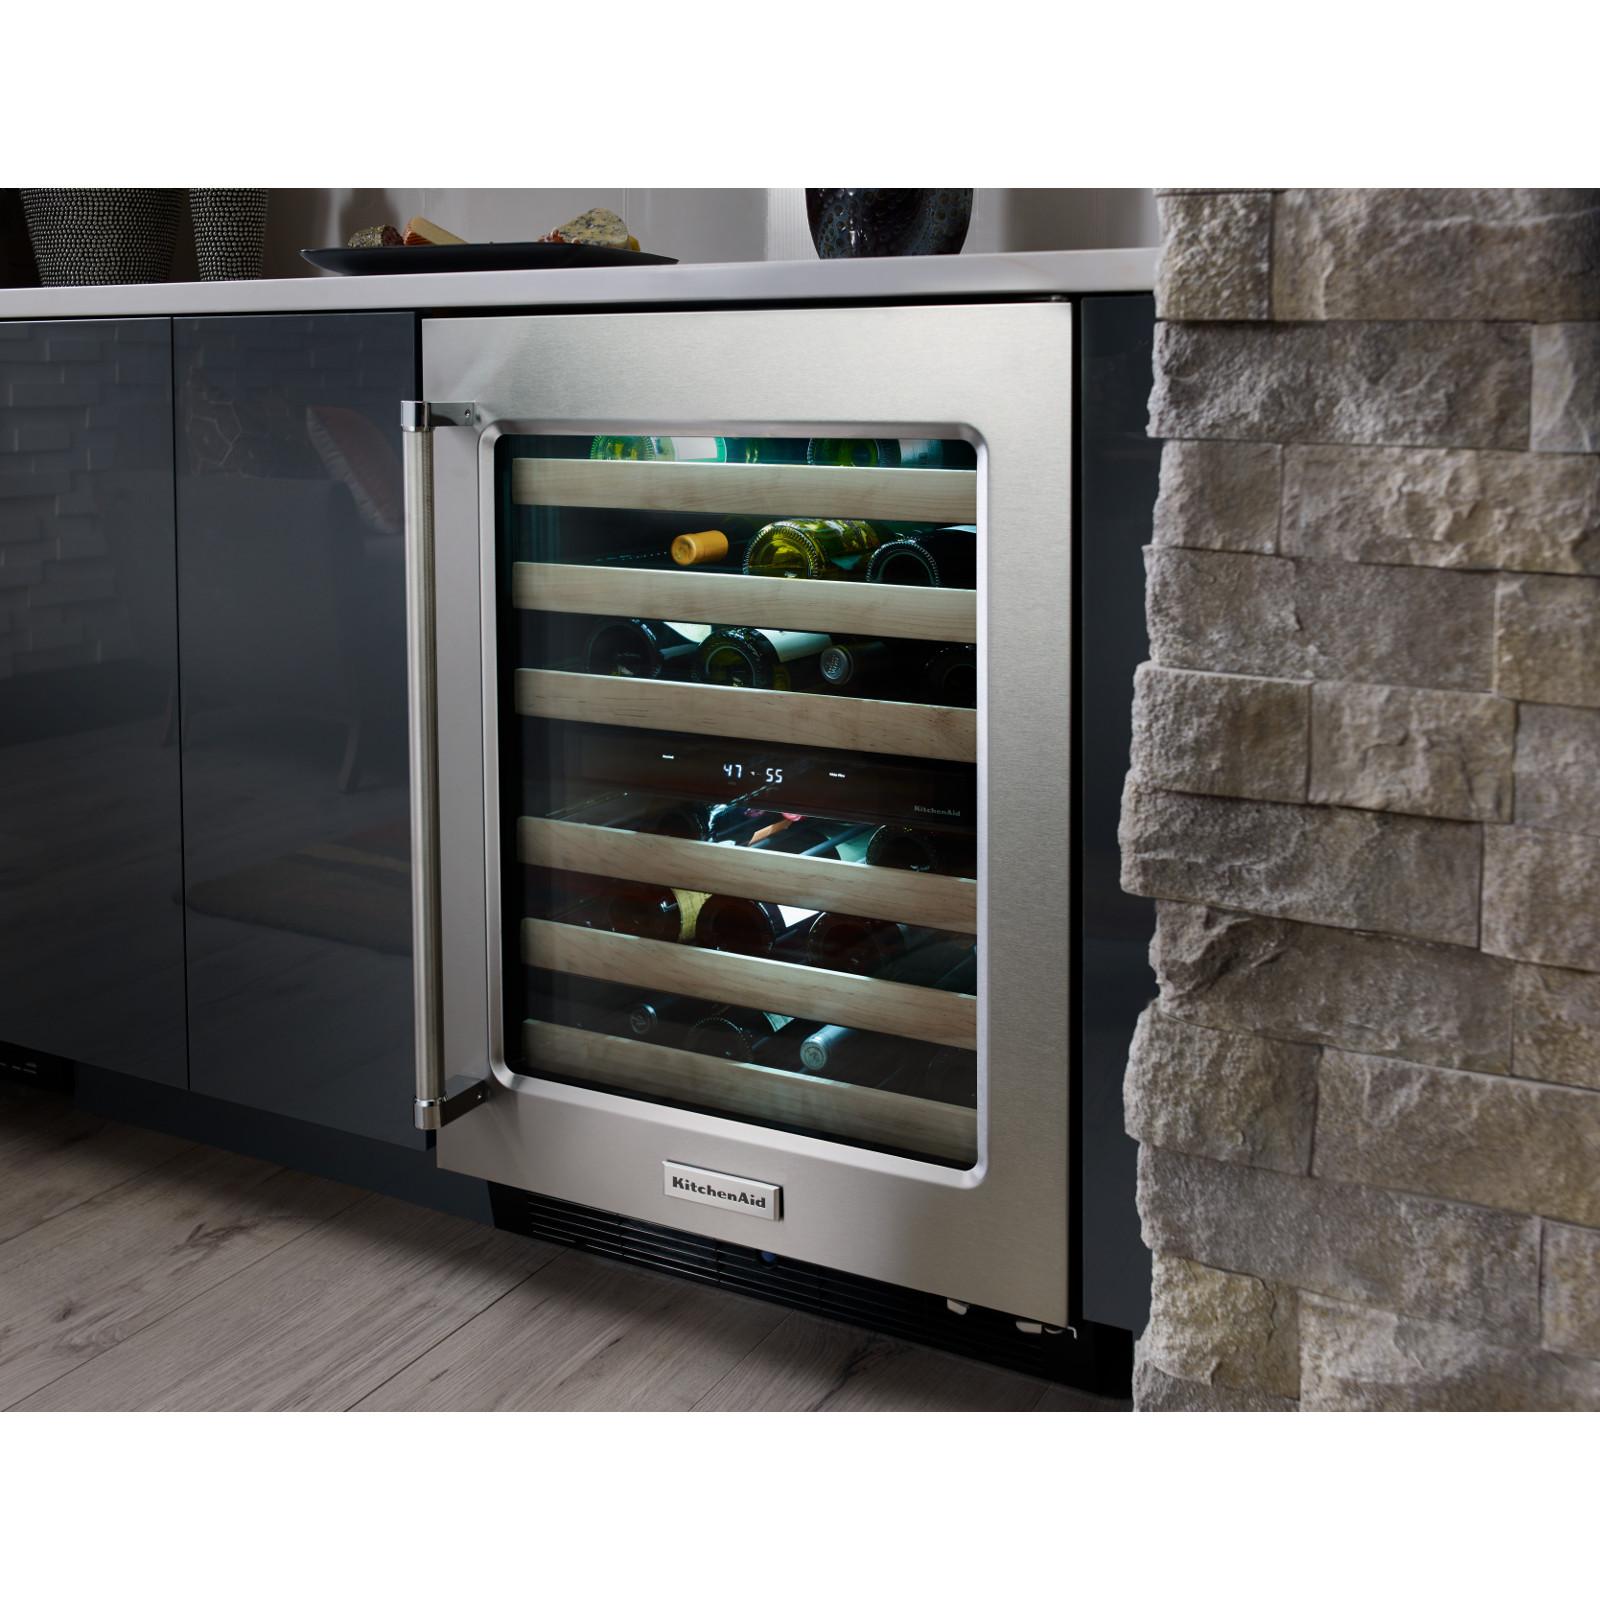 KitchenAid KUWL204ESB 4.7 Wine Cellar - Stainless Steel